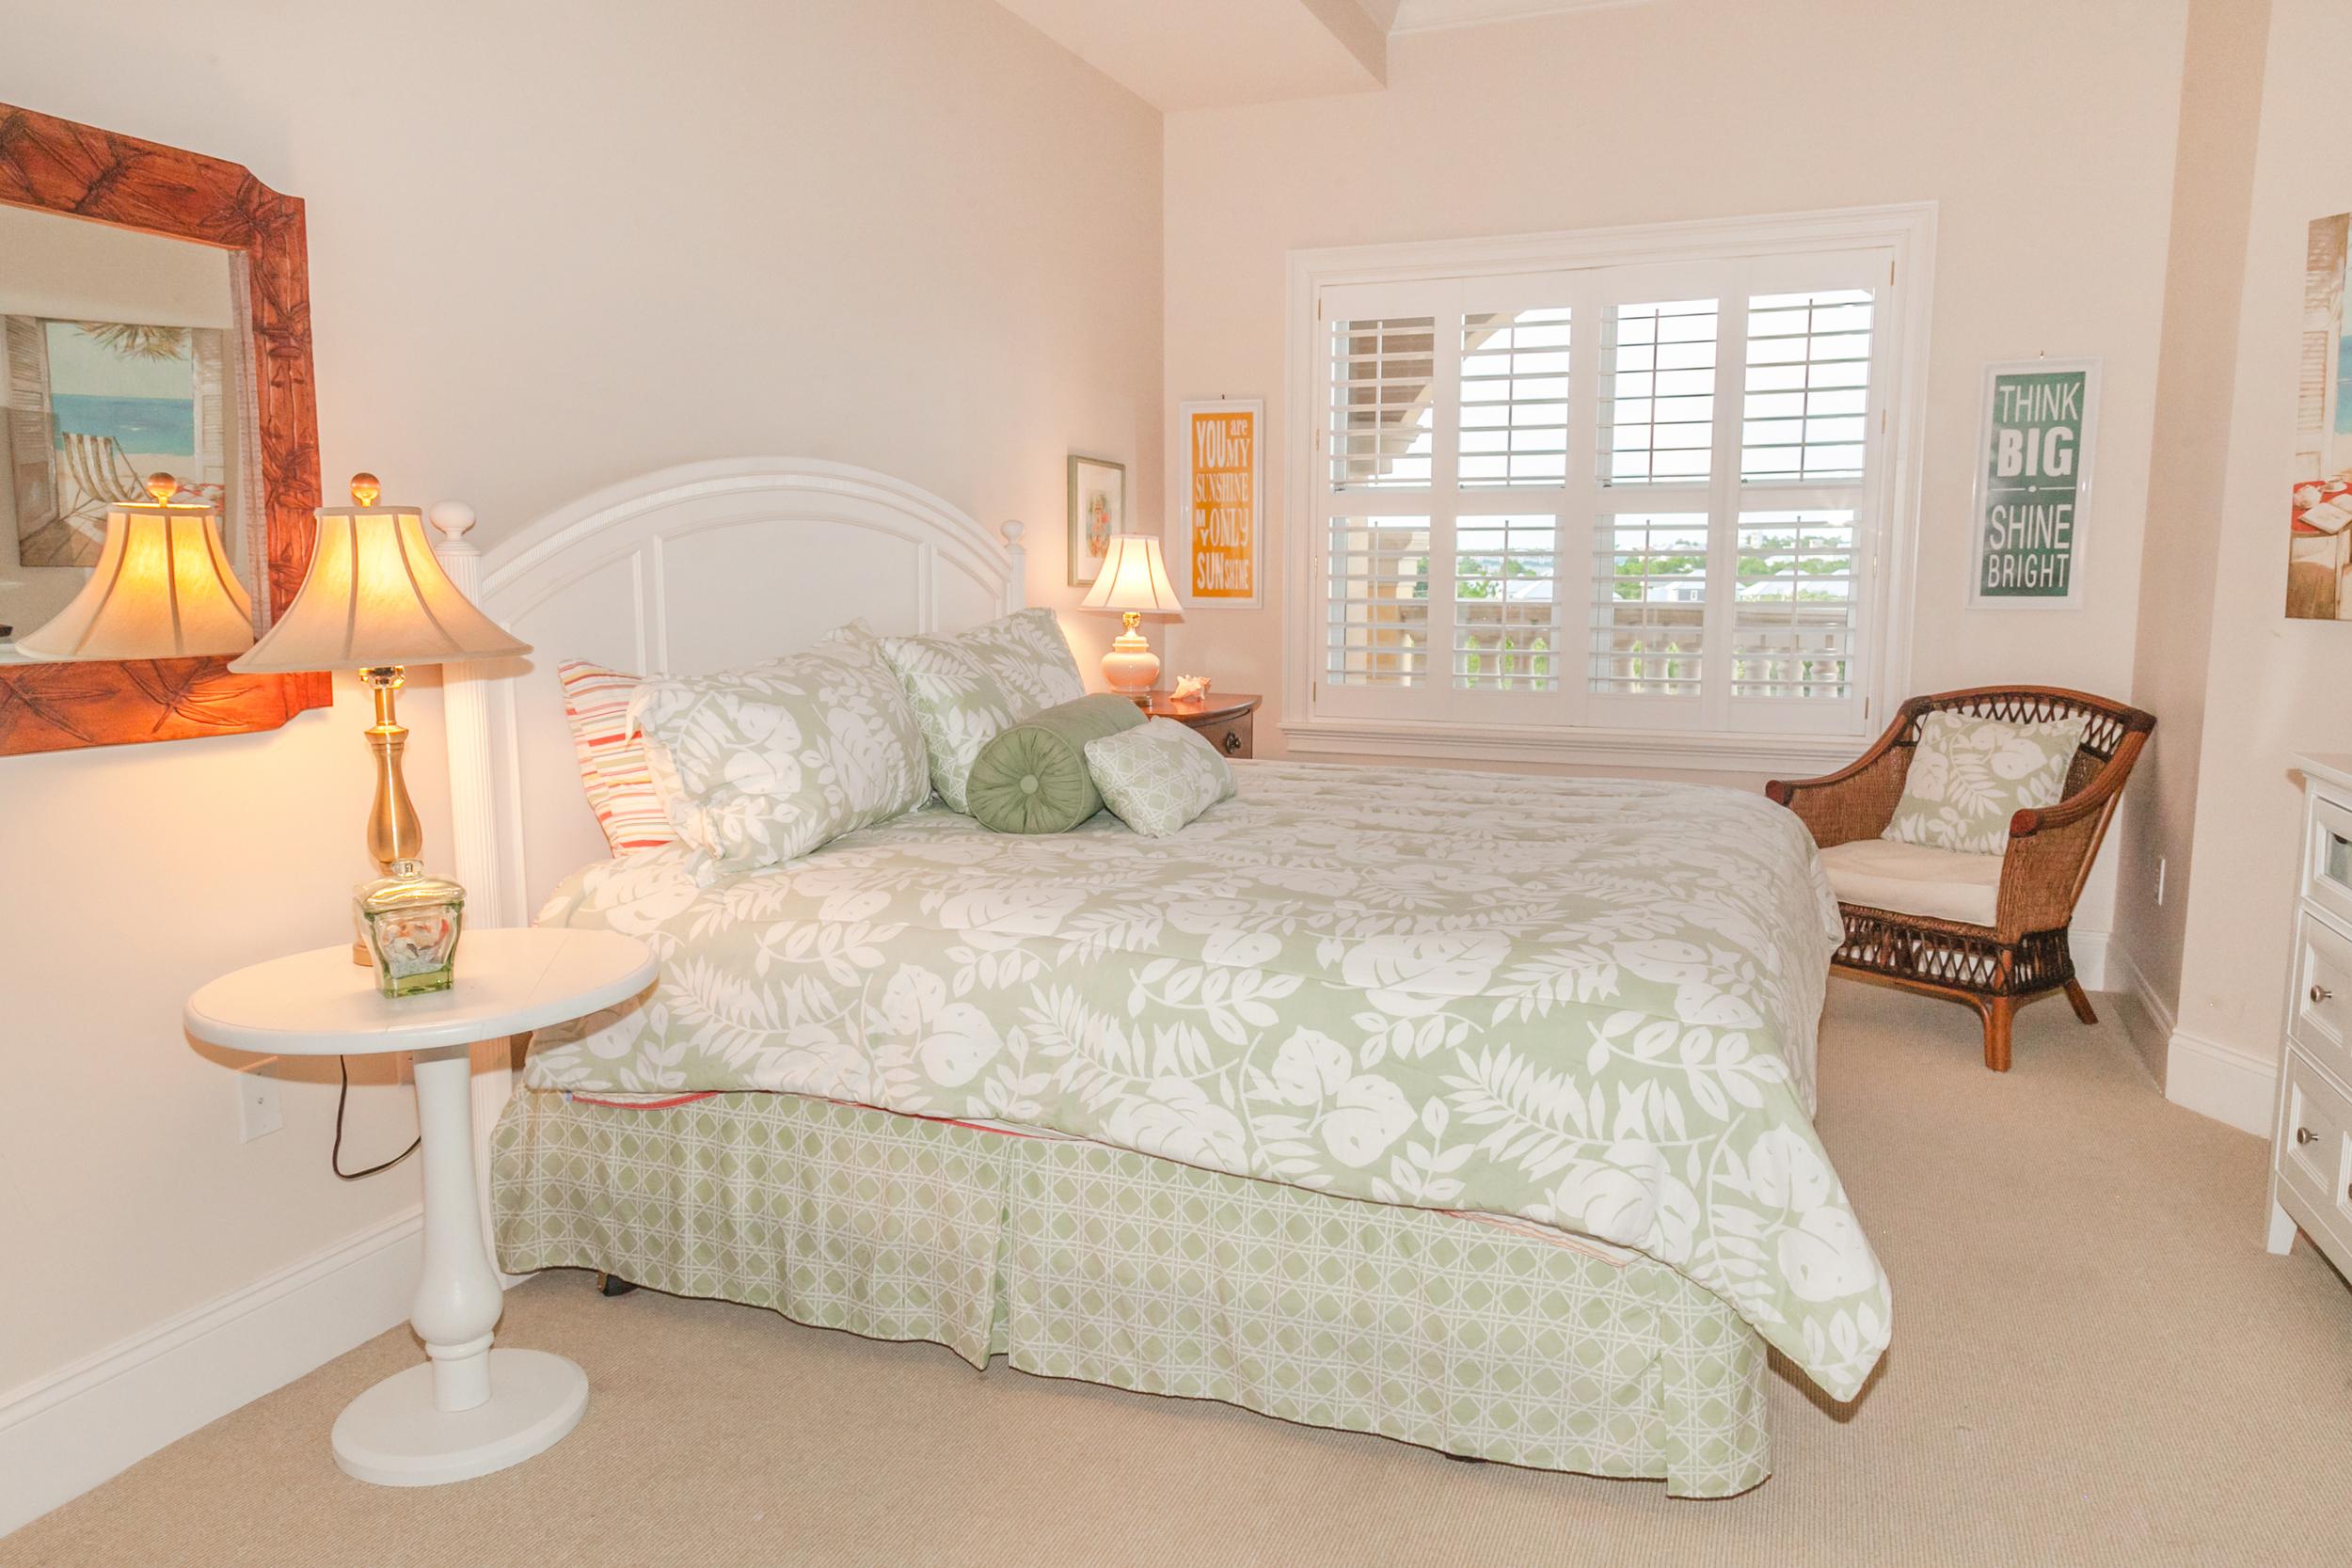 Adagio Penthouse A401 Guest Bedroom 2